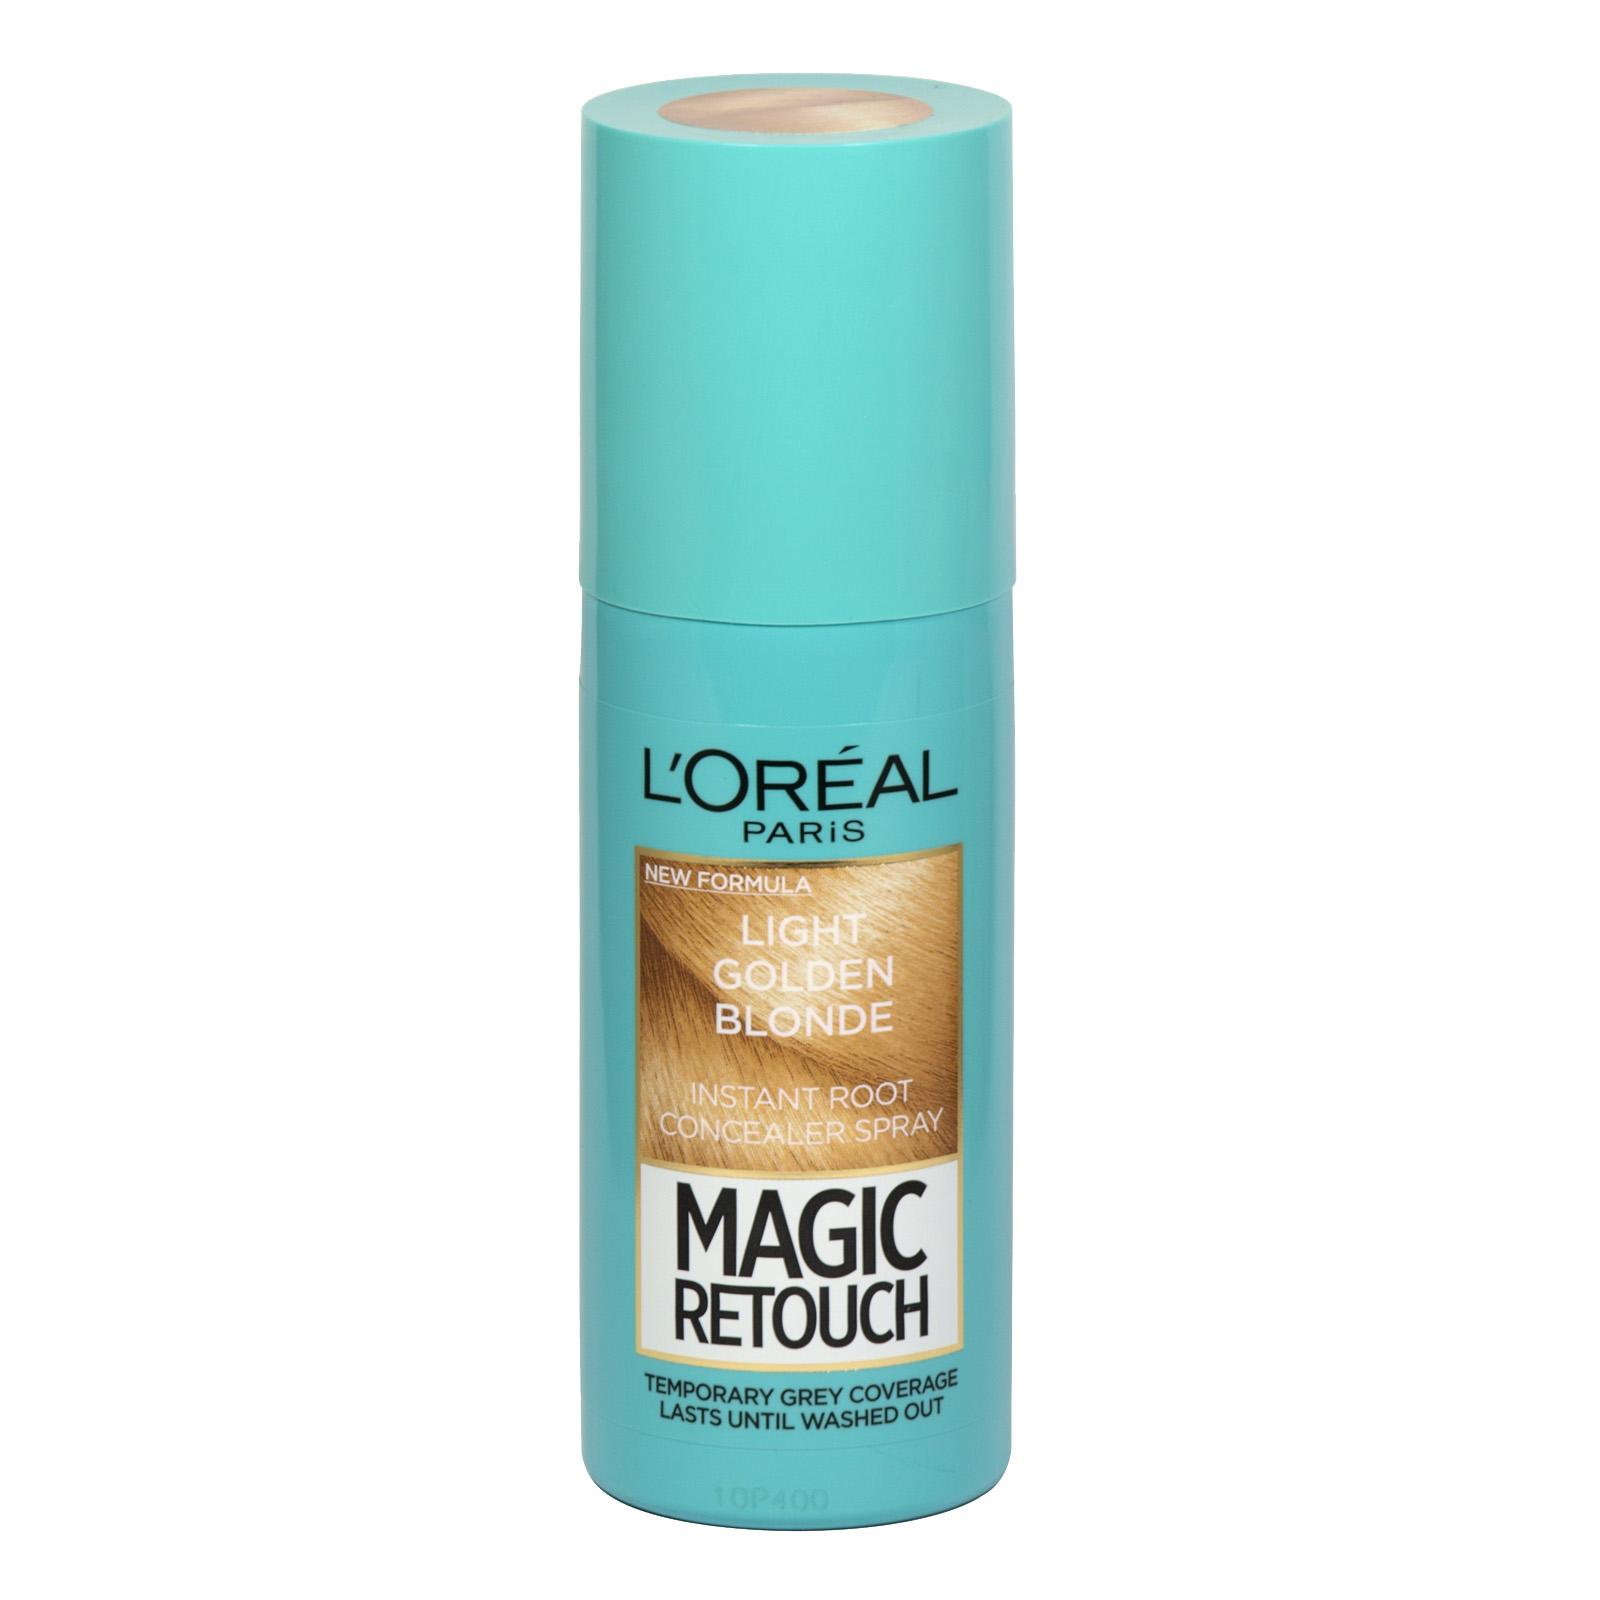 MAGIC RETOUCH 75ML SPRAY LIGHT GOLDEN BLONDE X6